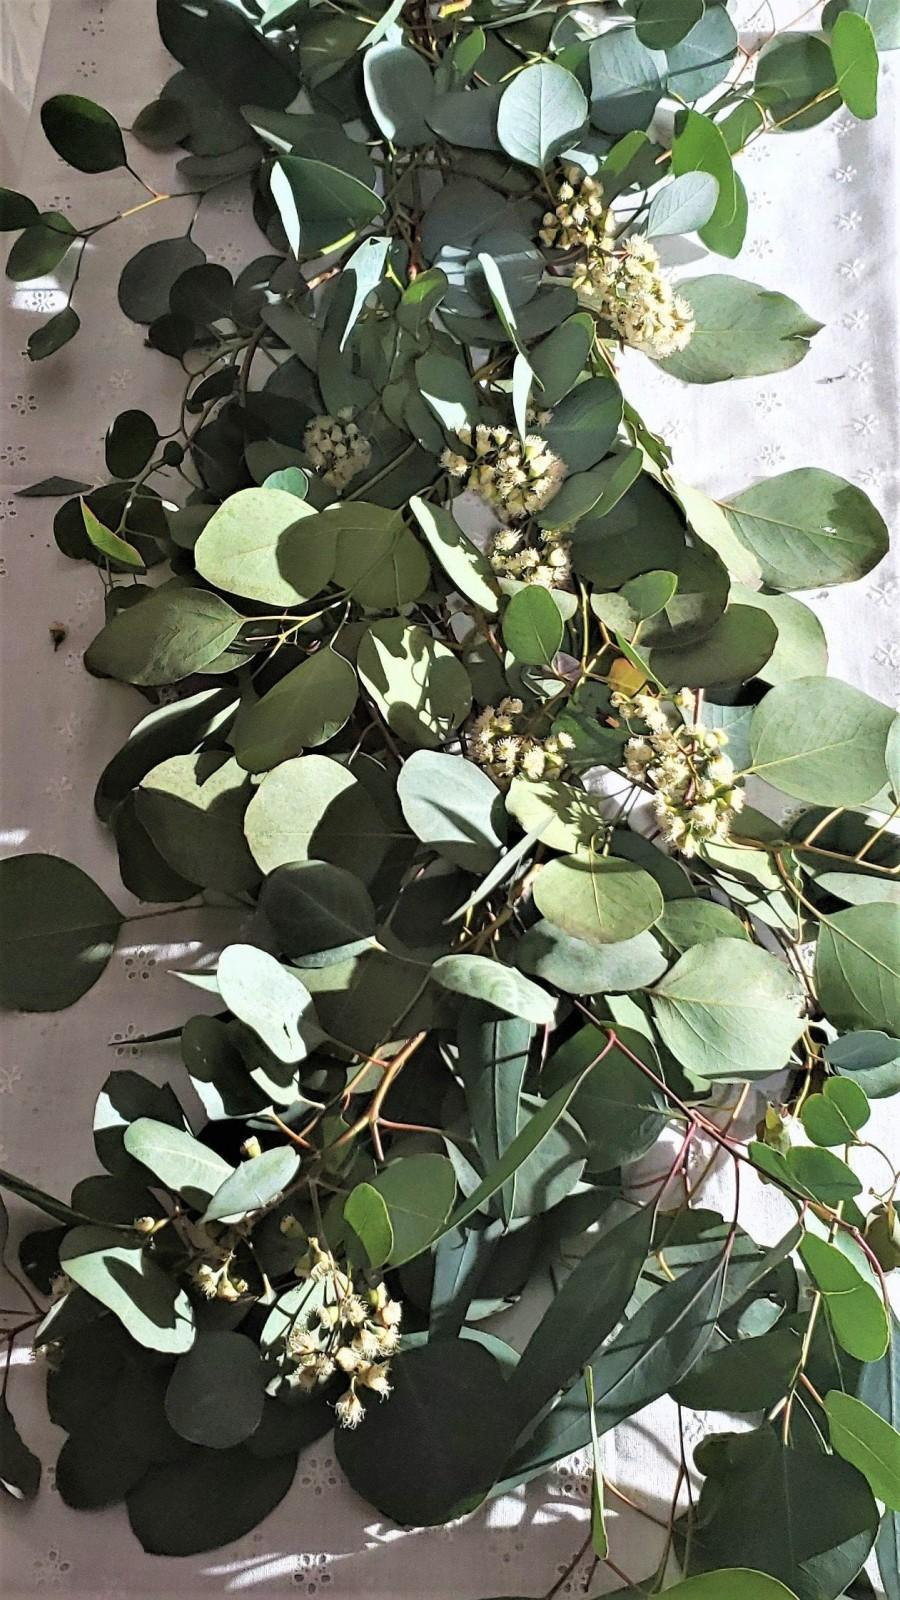 Wedding - Silver Dollar Eucalyptus Stems in Bundles of 10, Wedding Flowers, Wedding and Event Greenery,Fresh Eucalyptus,DIY Wedding Decor, Floral Stem